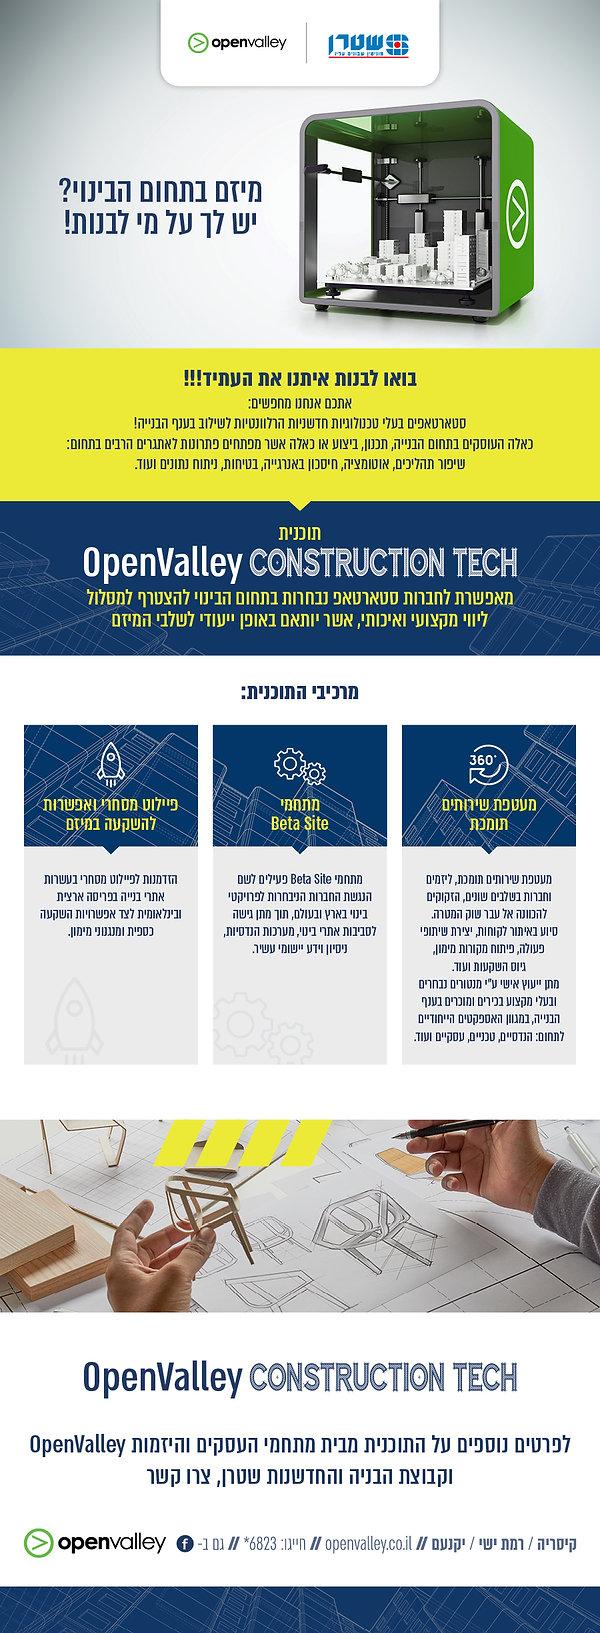 openvalley_stern_construction_tech_progr